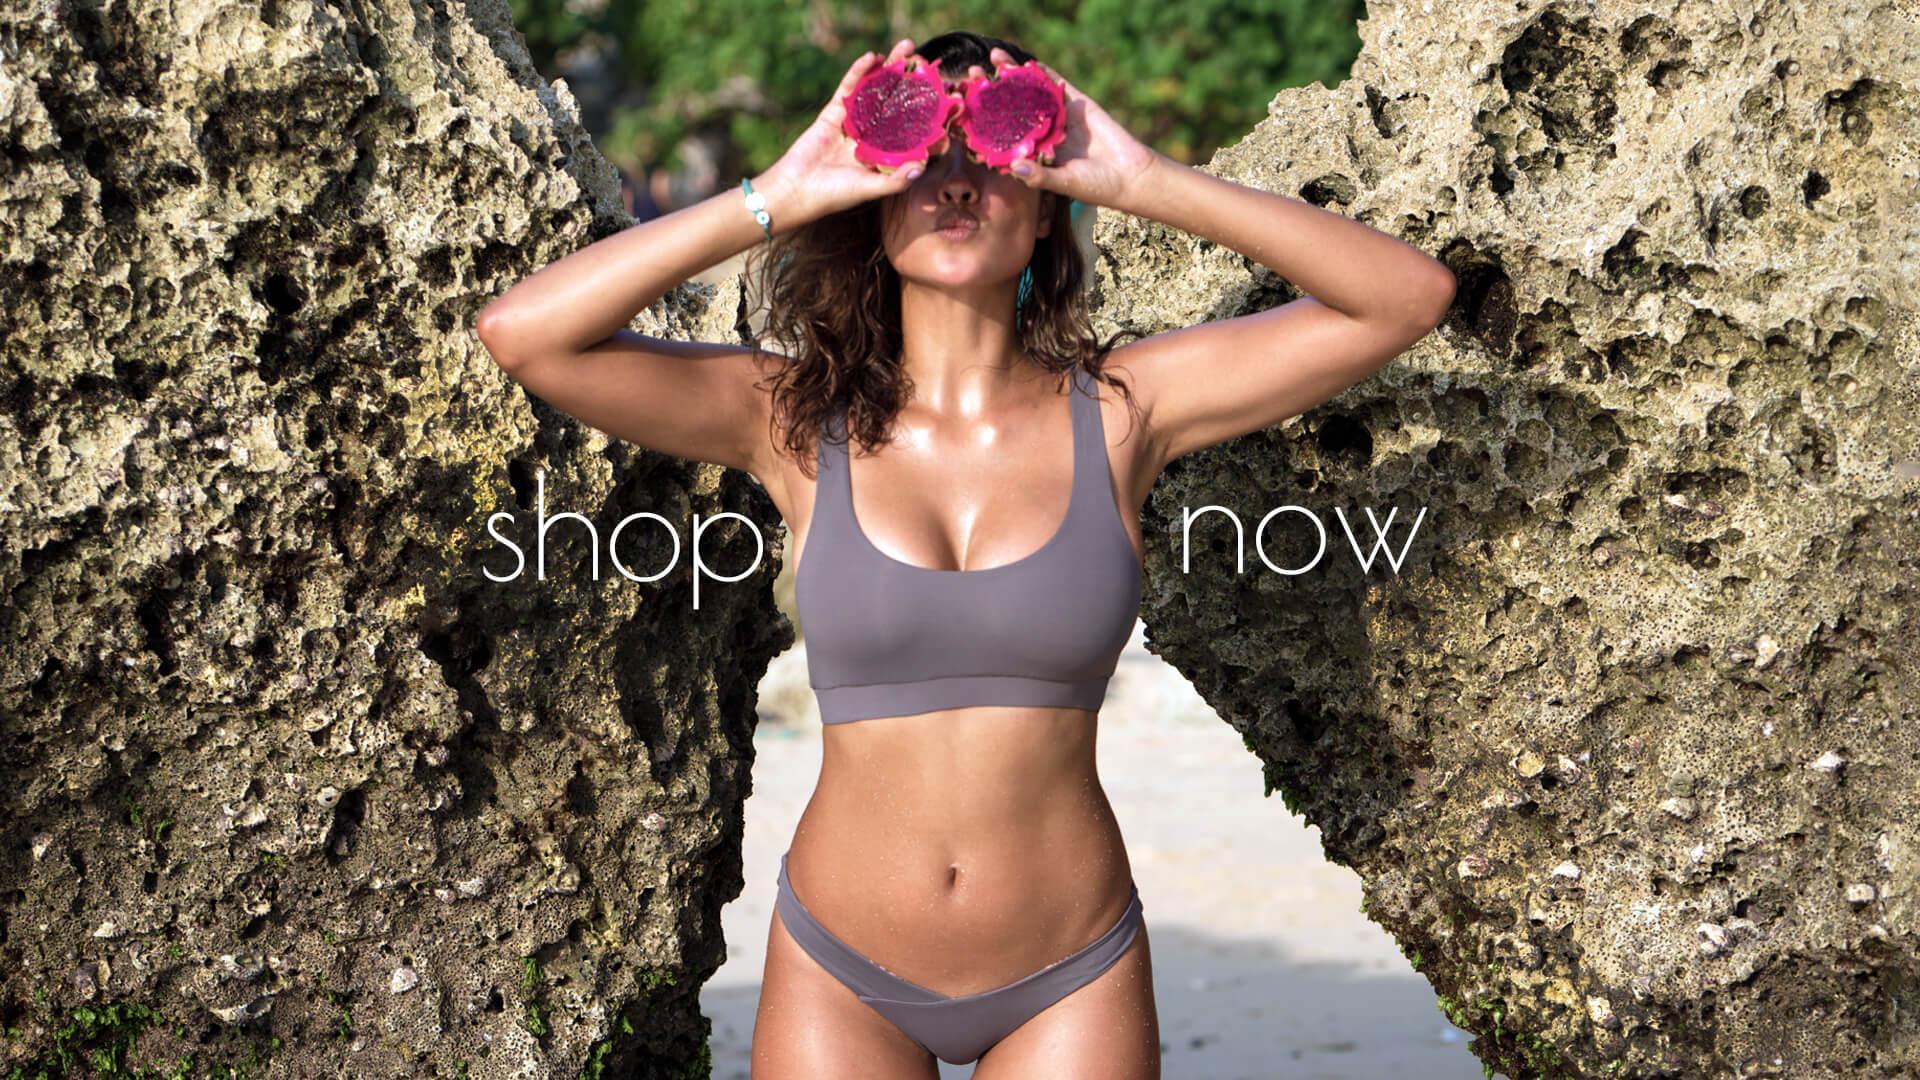 Manifest bikinis home page 3